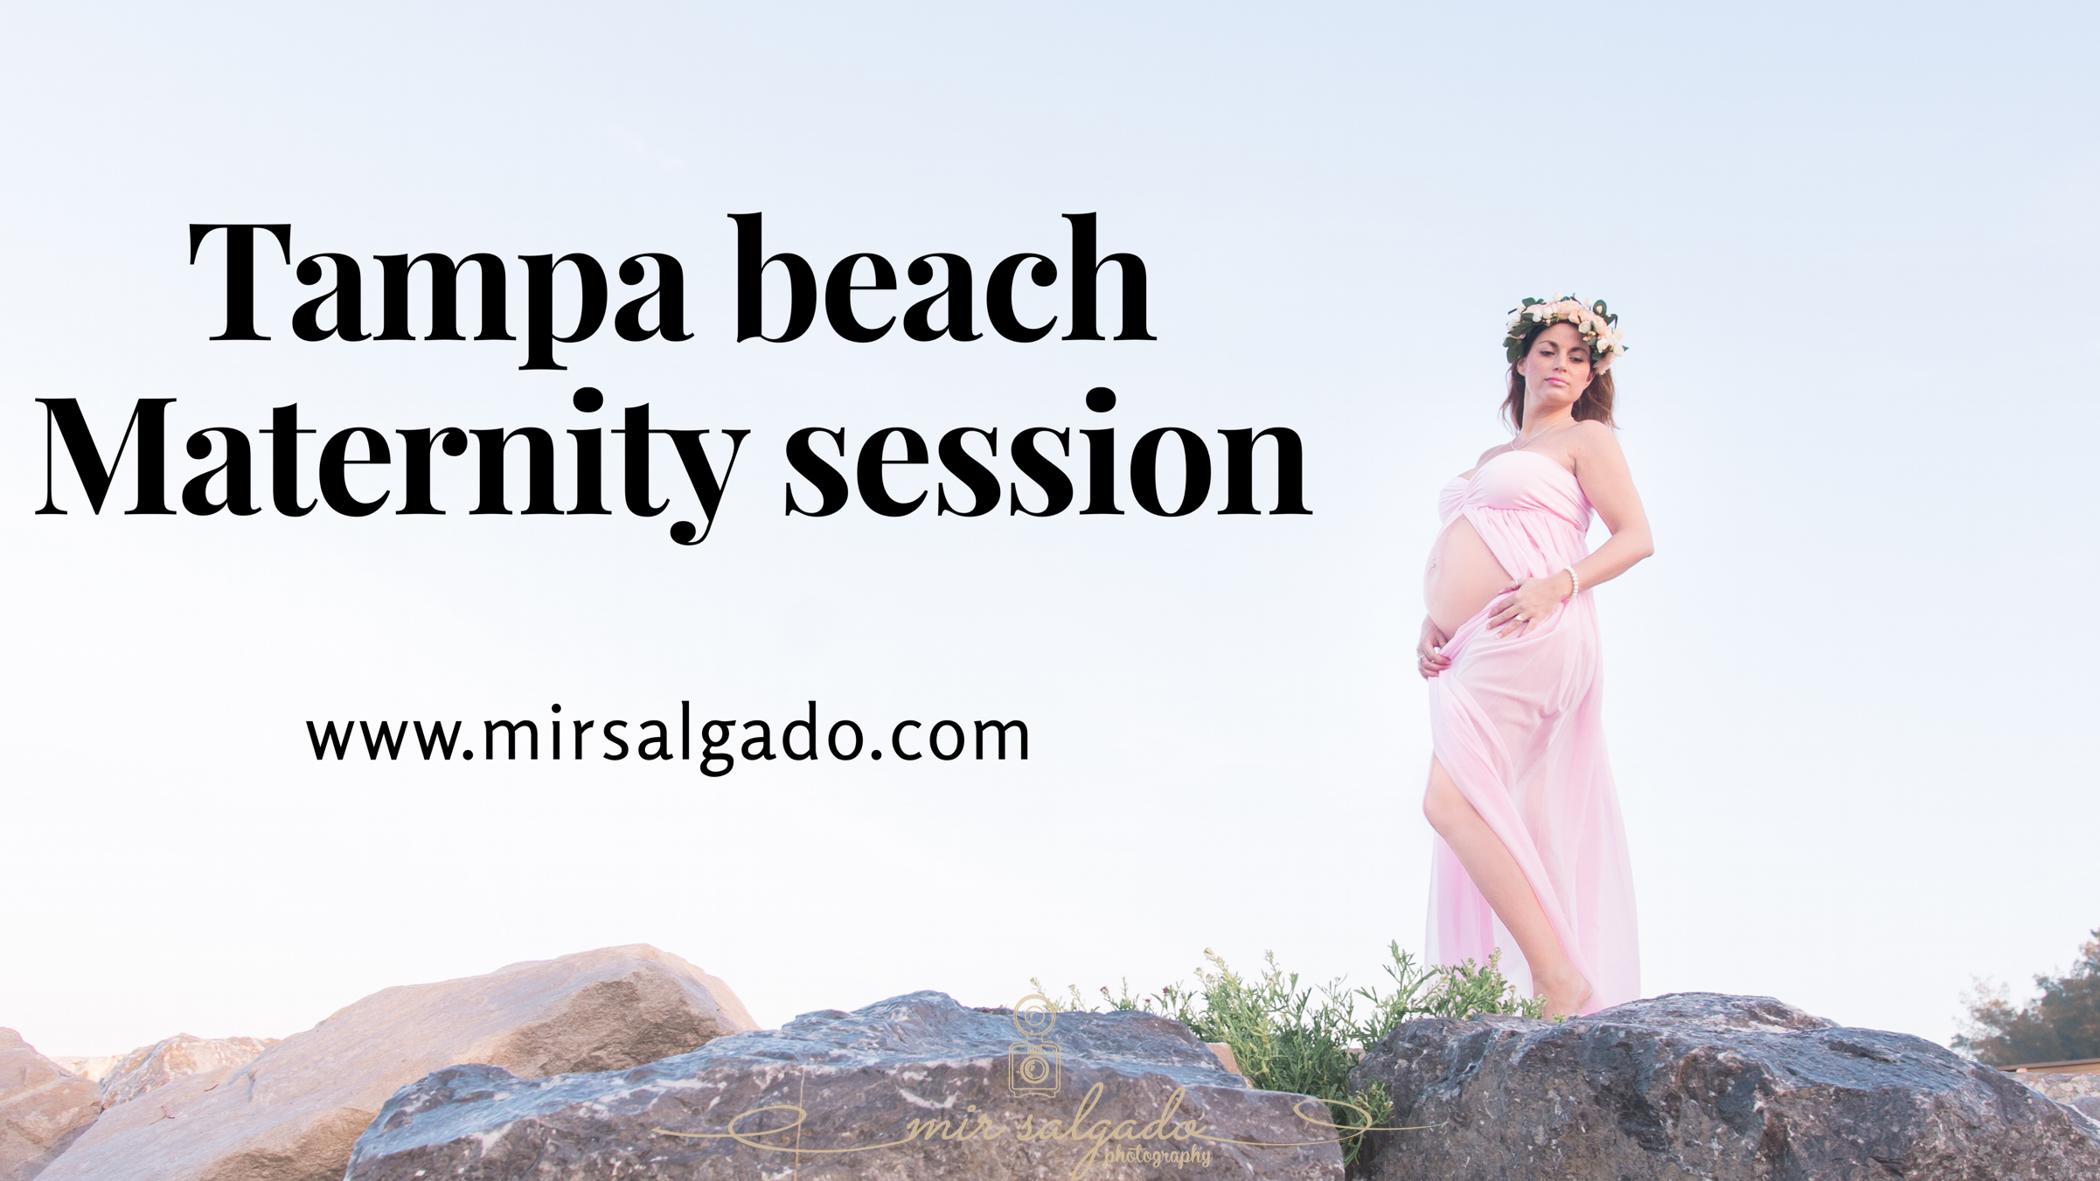 St.Pete-maternity-session, sunrise-beach-maternity-session